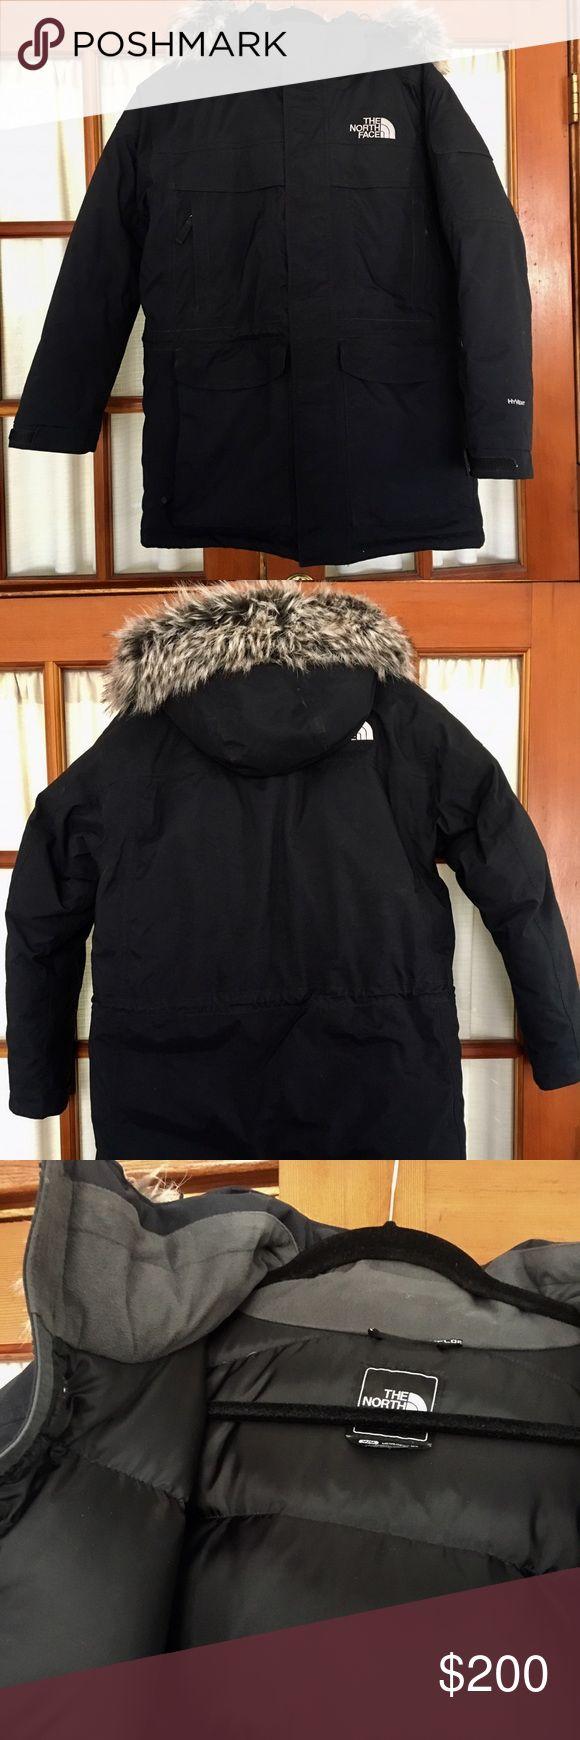 Men's North face parka coat Men's-medium-black-Excellent condition-like new with no wear- North Face Jackets & Coats